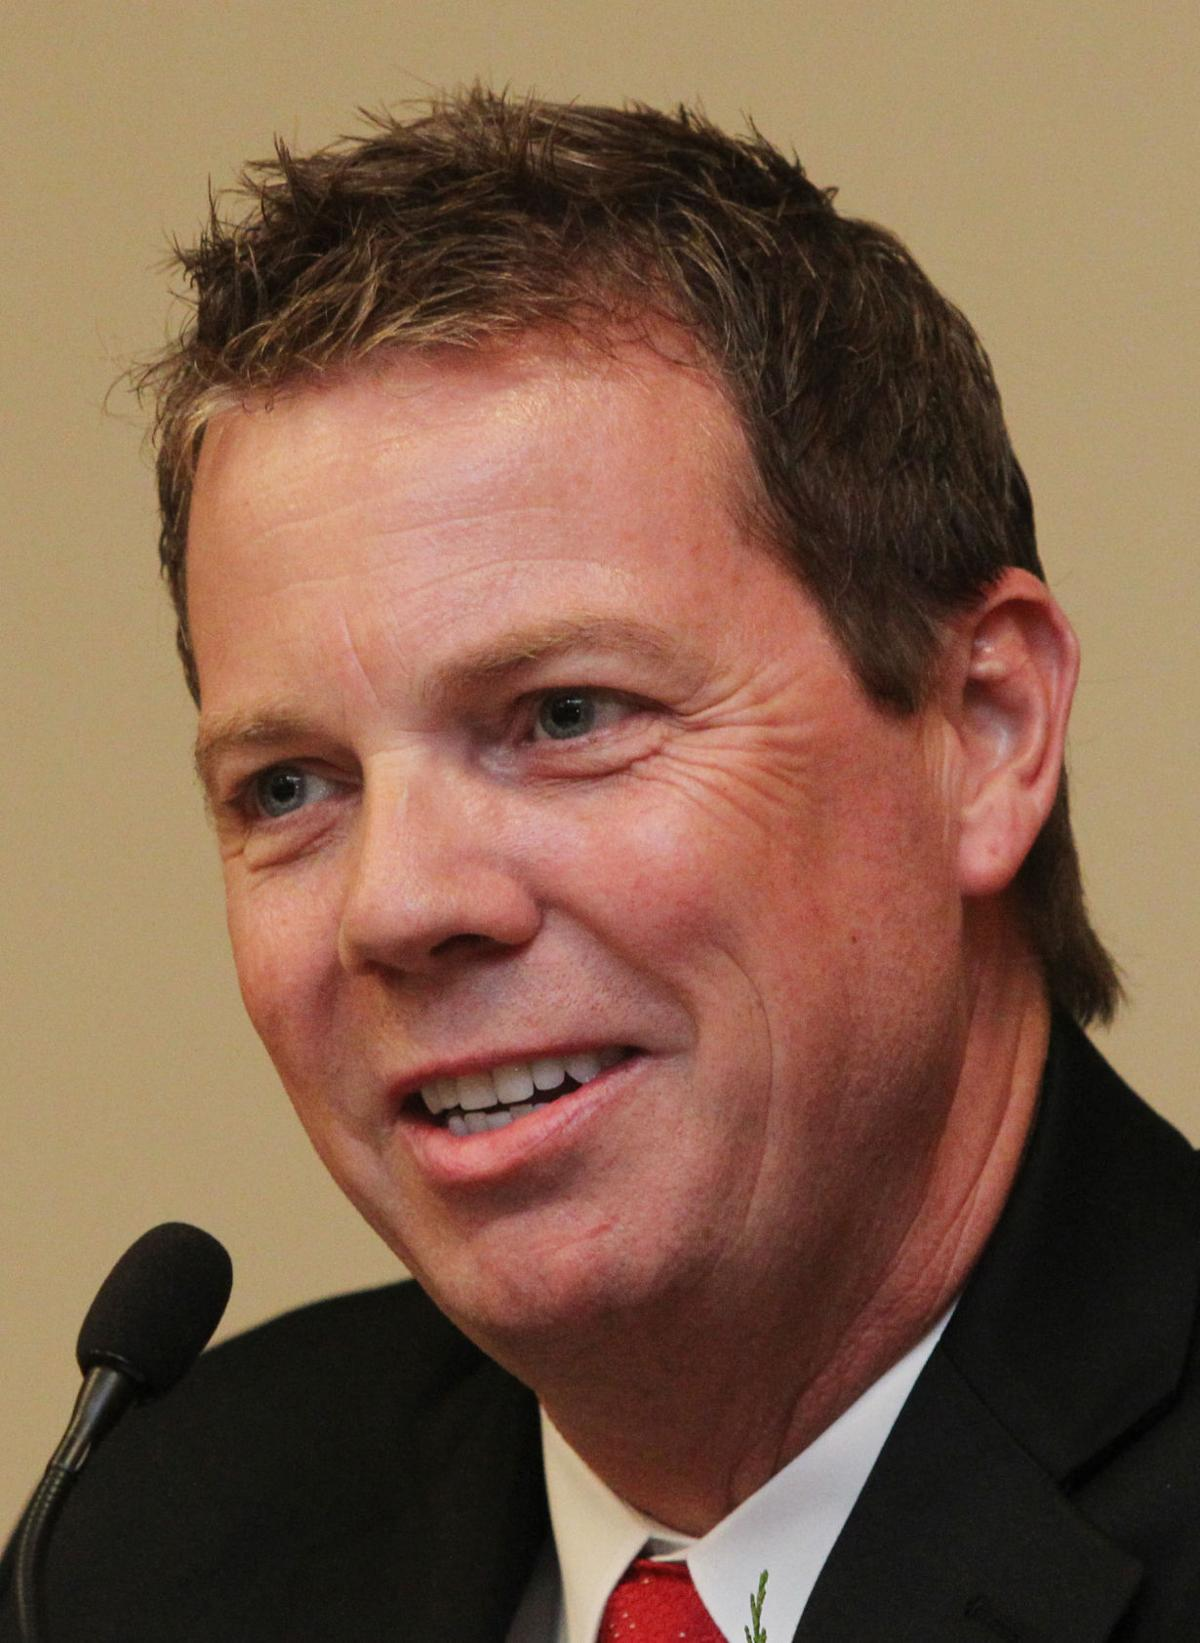 Bakersfield Councilman Chris Parlier